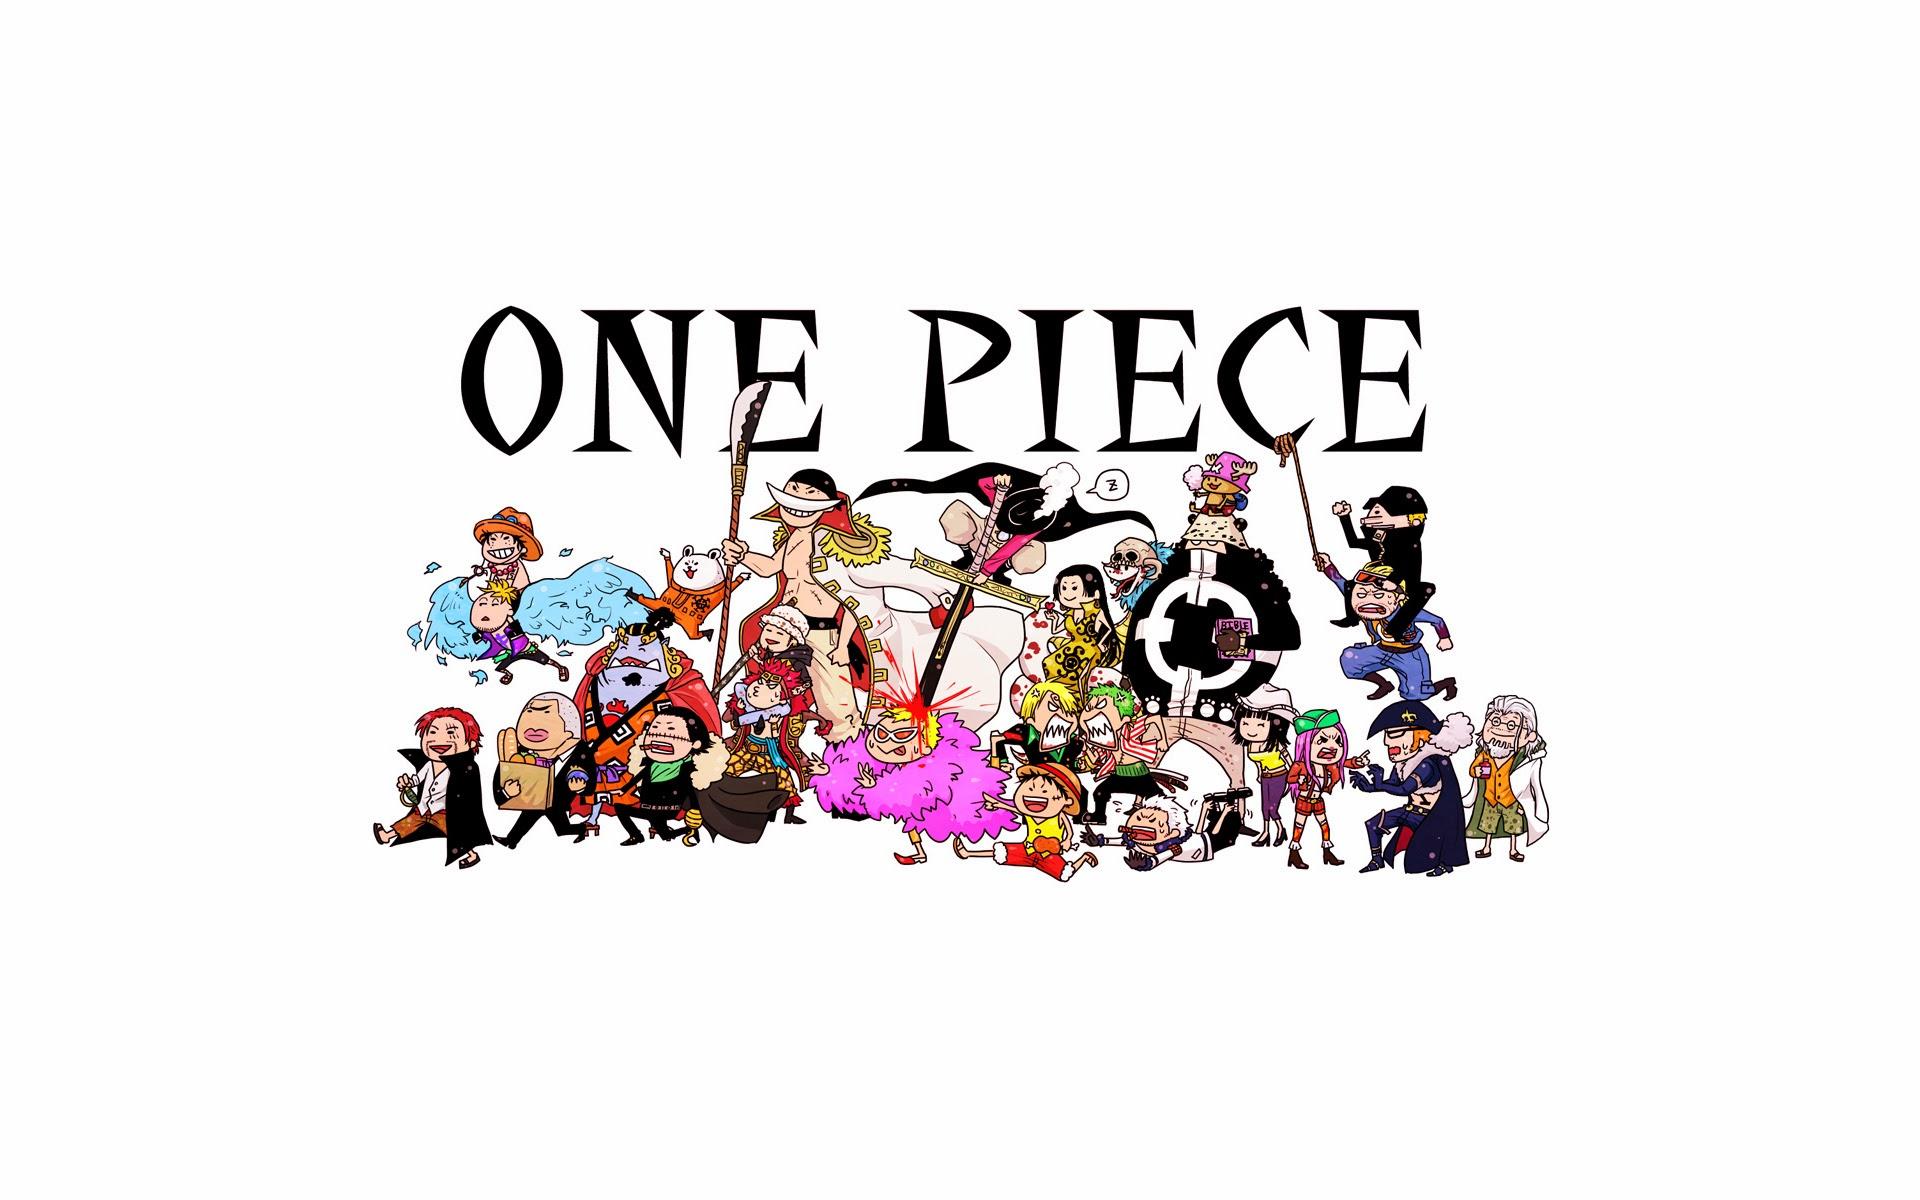 One Piece Anime Chibi Hd Wallpaper 1920x1200 2g